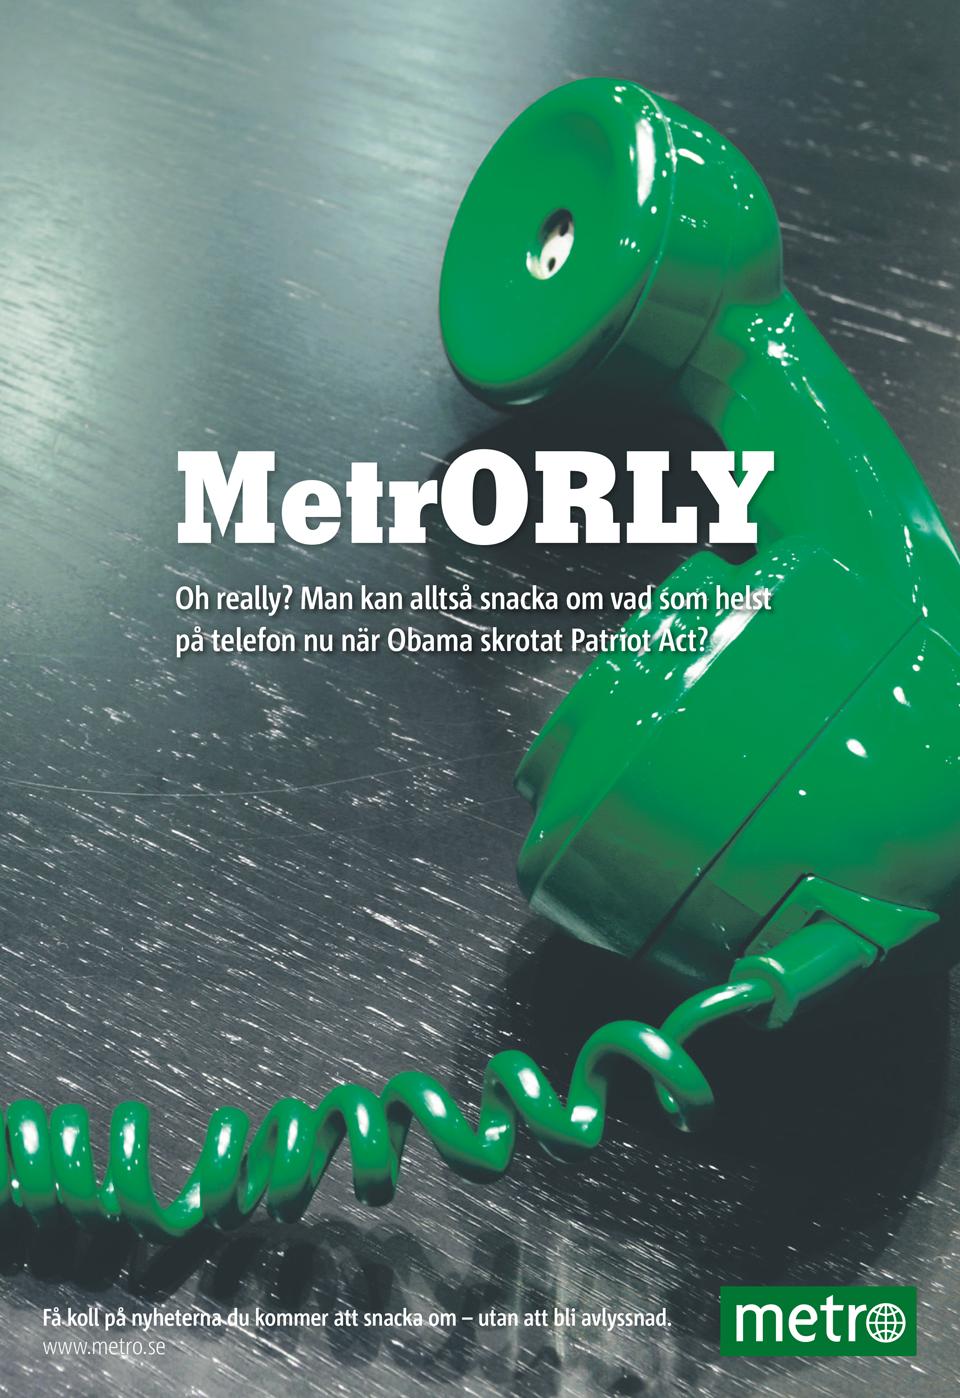 Metro-Specifik_4_370x254-960.png